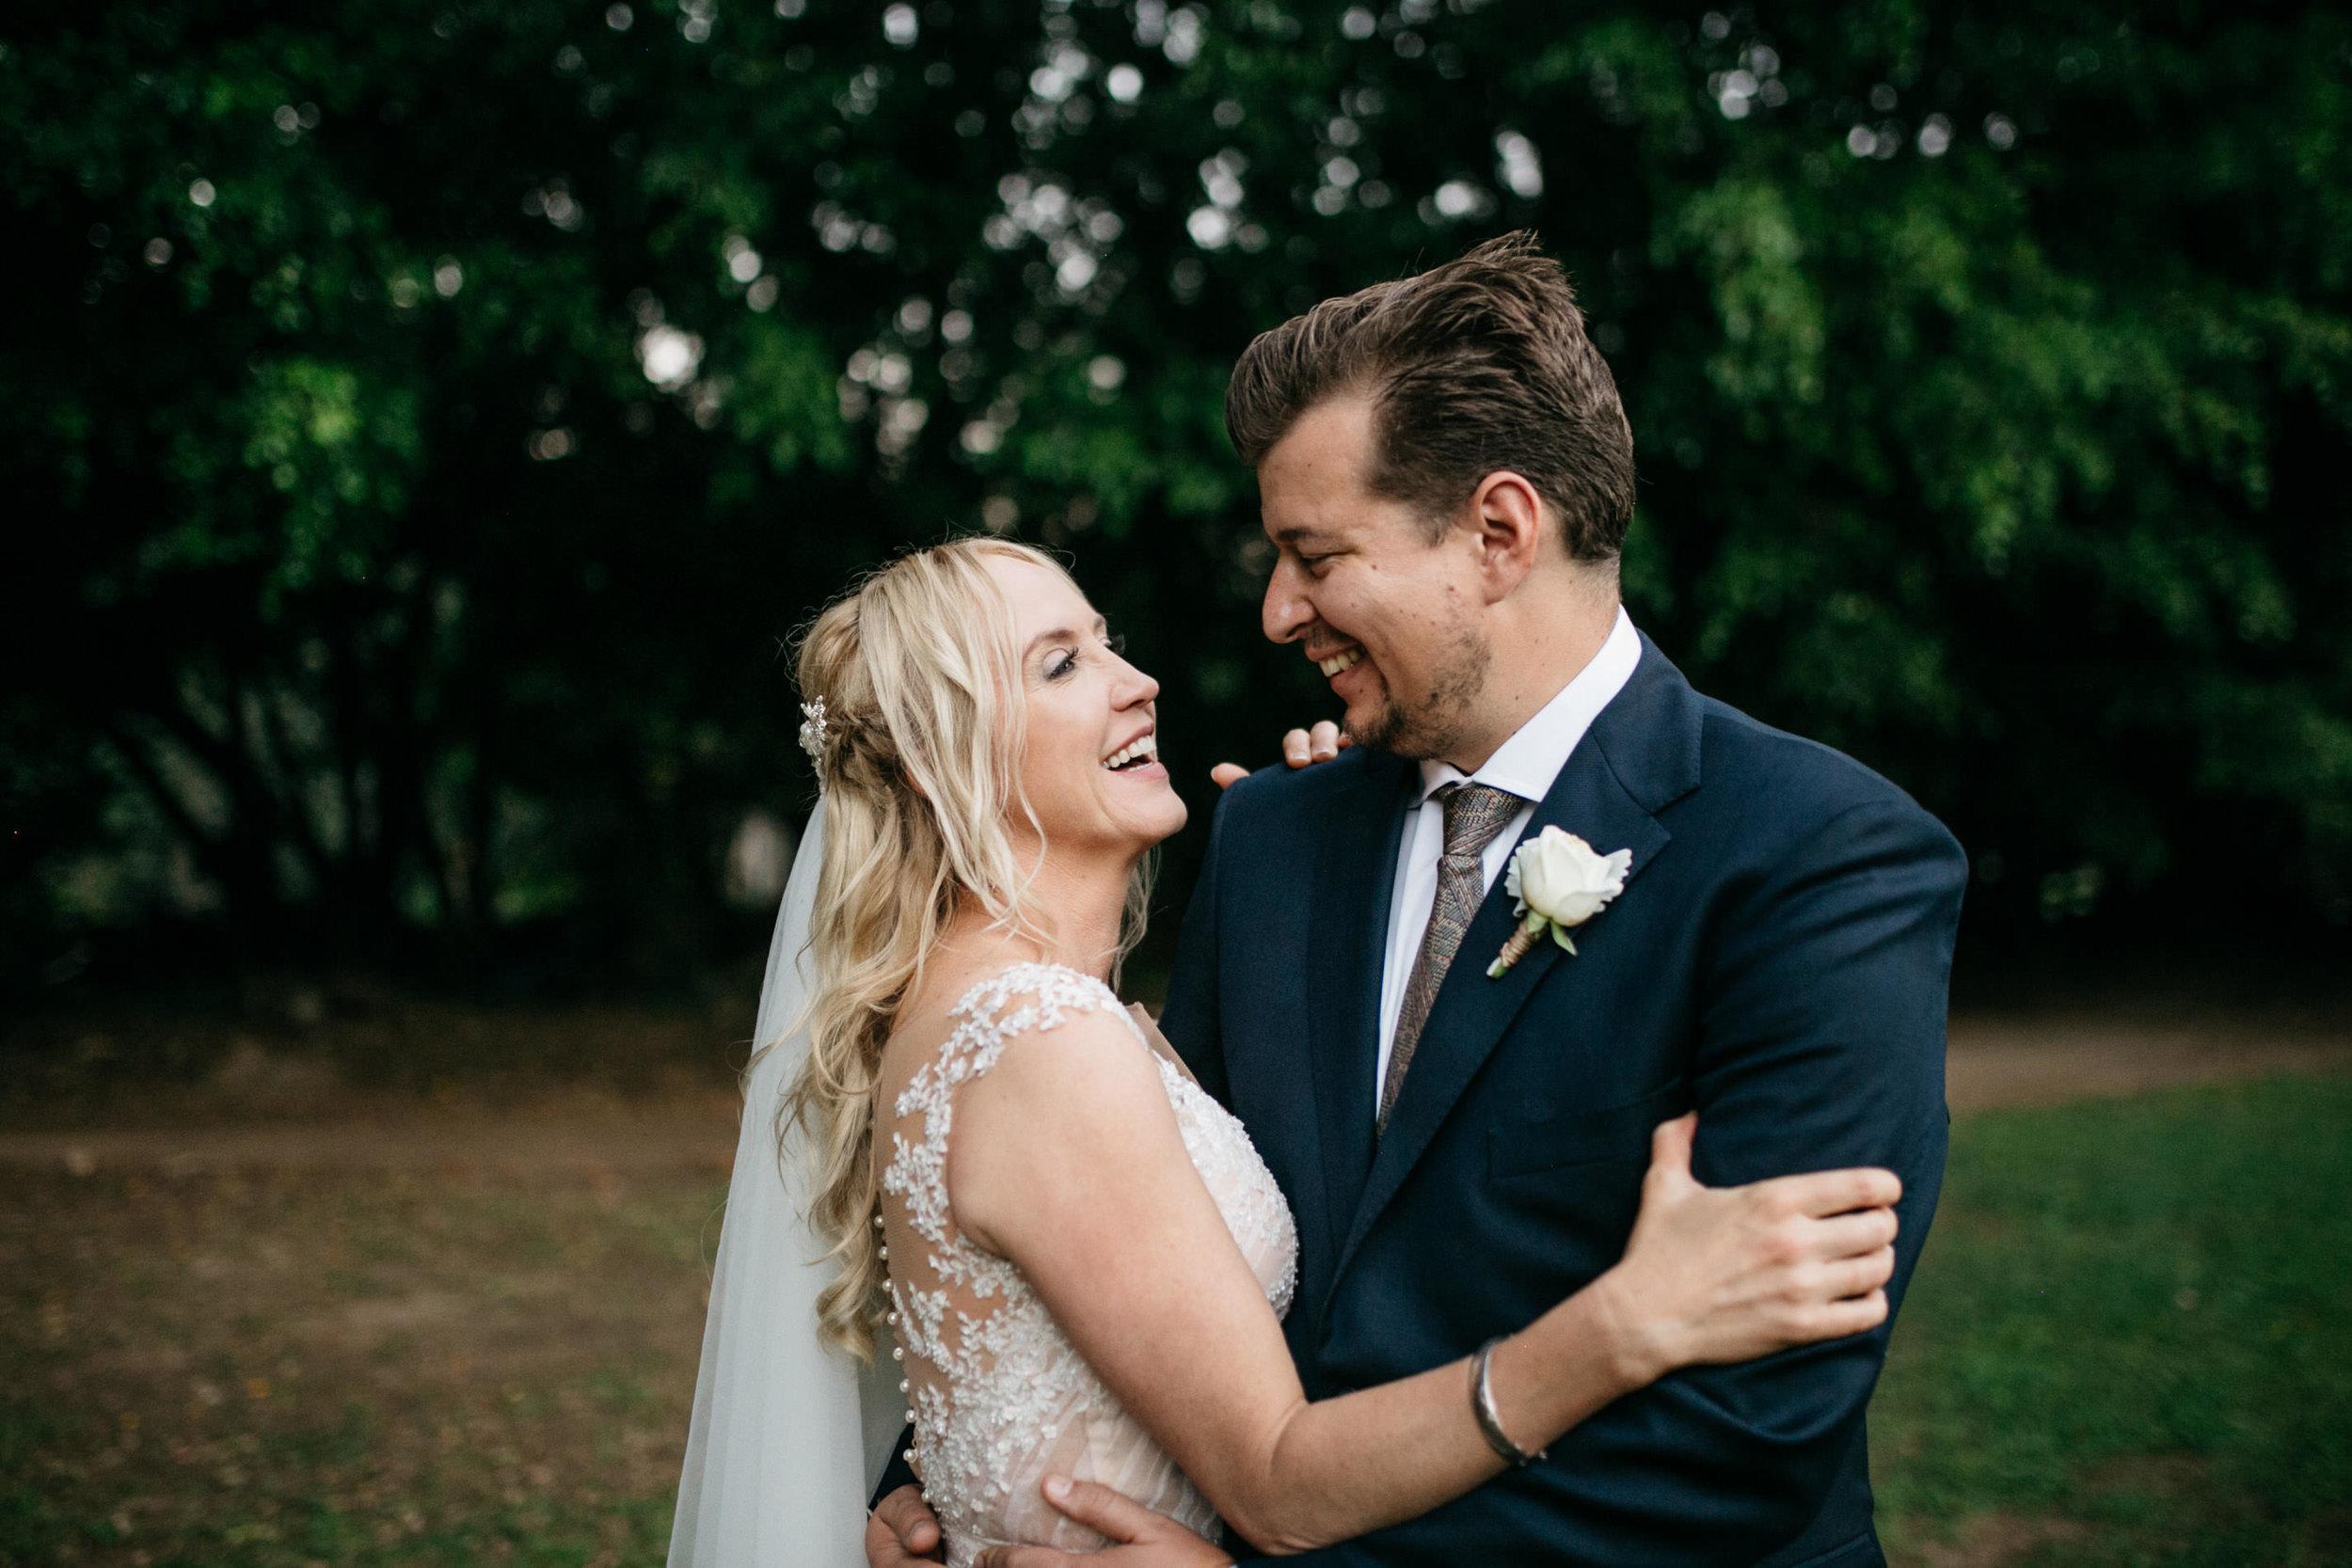 True North Photography_Boomerang Farm_Stacey and Isaac_Gold Coast Wedding_Barm Wedding_Hinterland Wedding-165.jpg